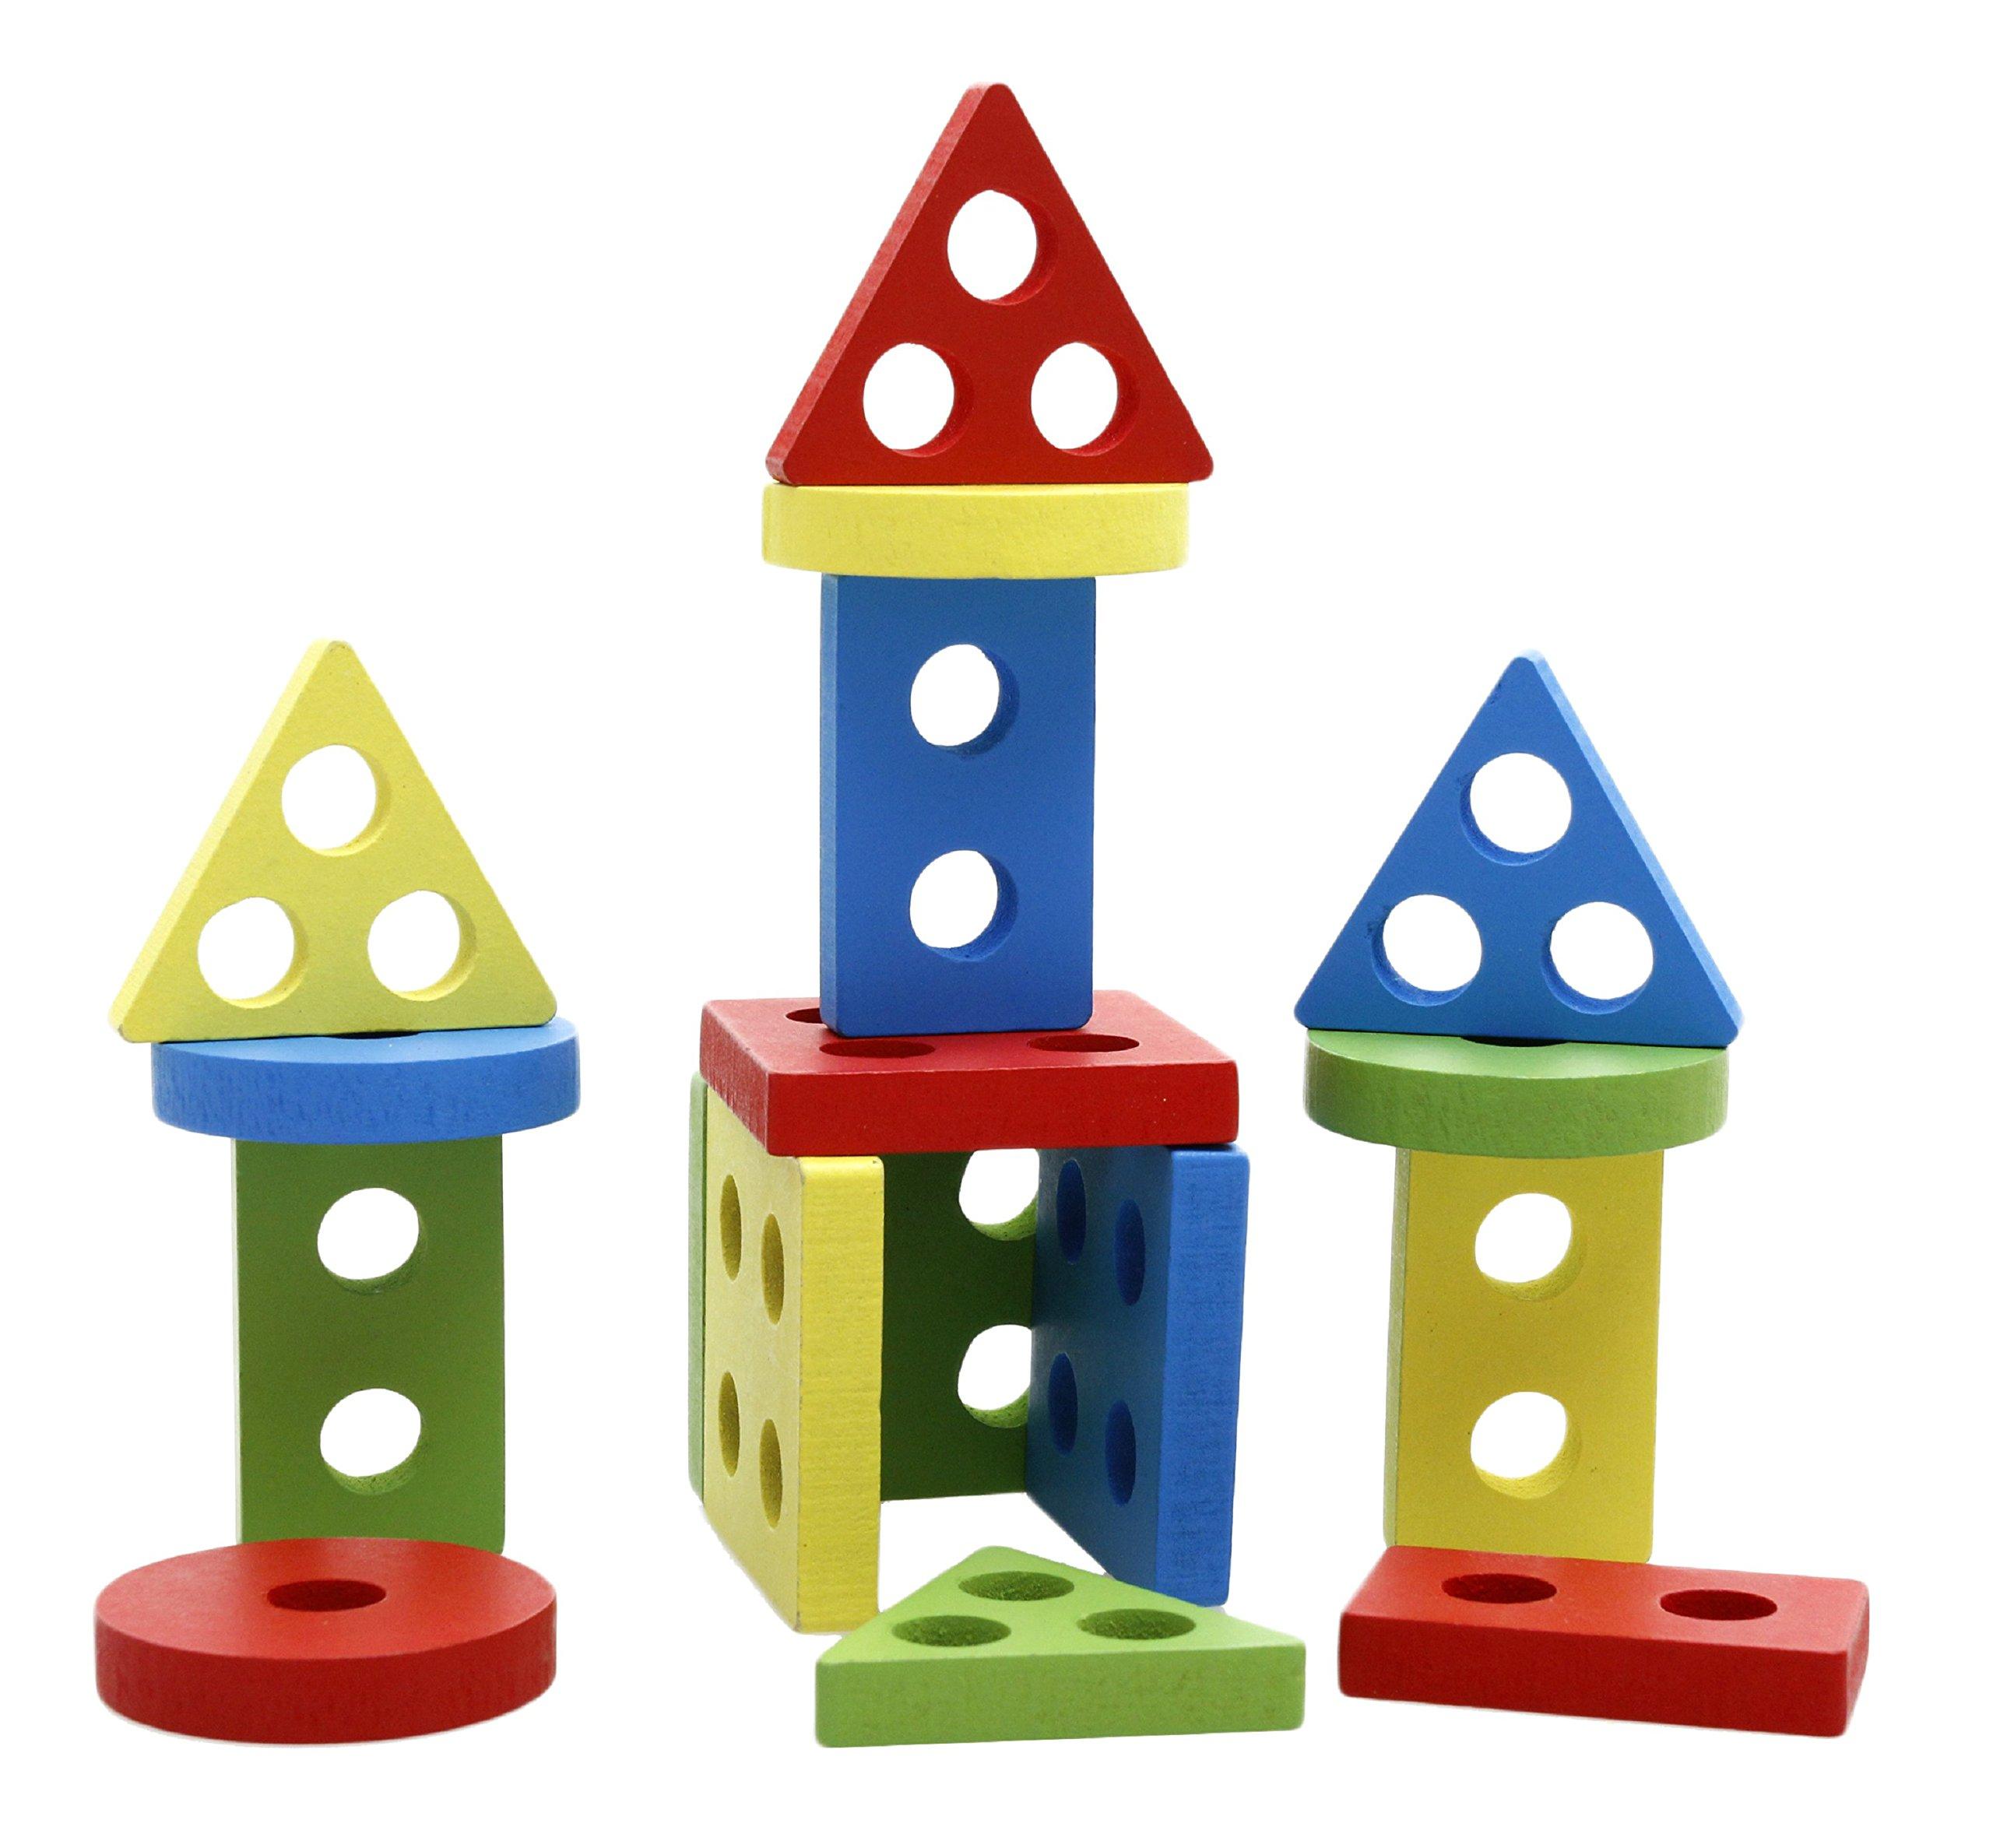 lewo wooden puzzle toddler toys shapes sorter preschool geometric blocks stacking games for kids. Black Bedroom Furniture Sets. Home Design Ideas